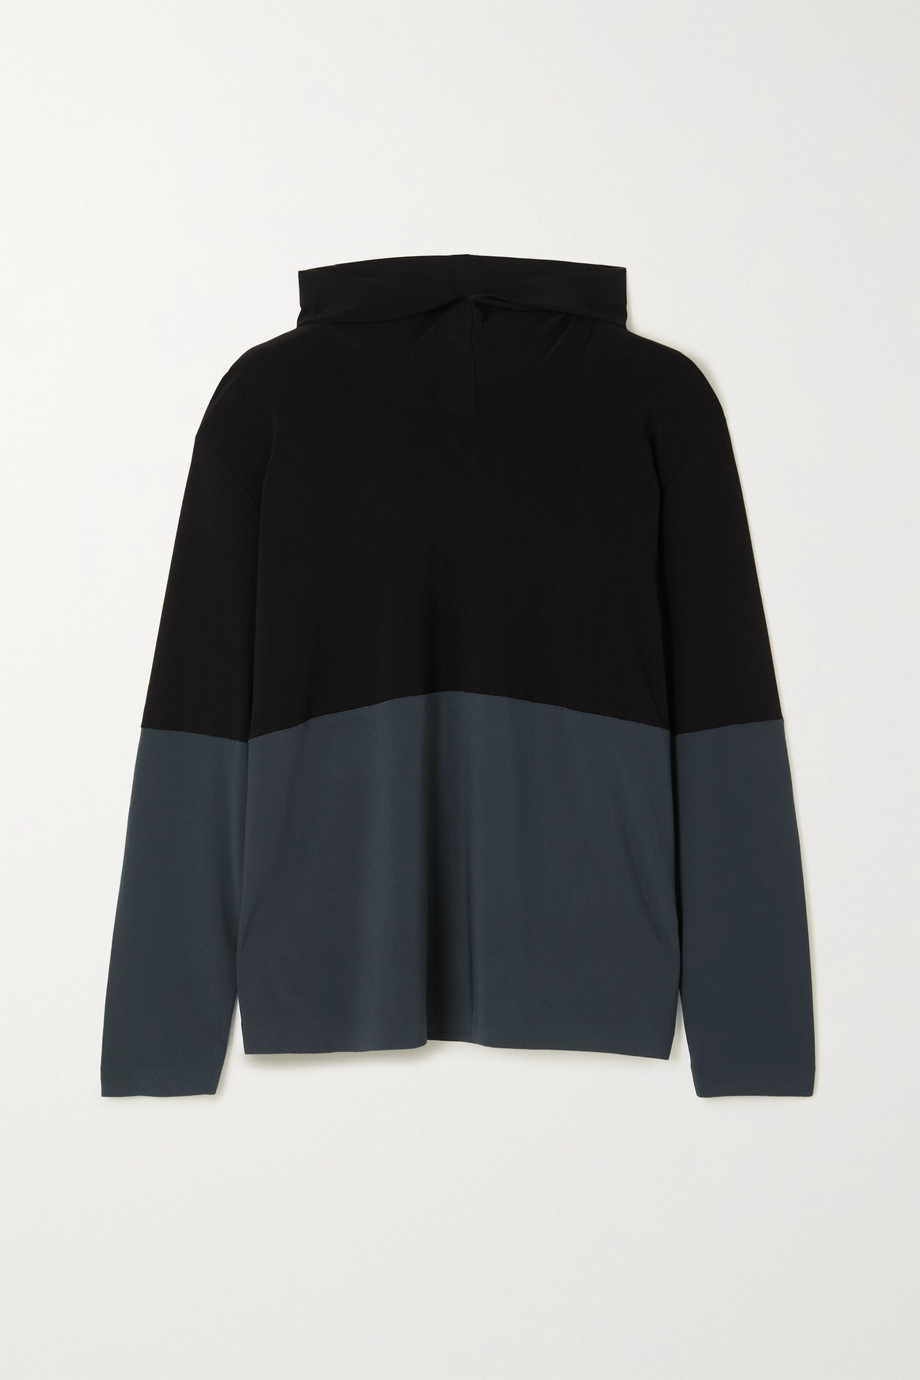 Norma Kamali Two-tone stretch-jersey hoodie